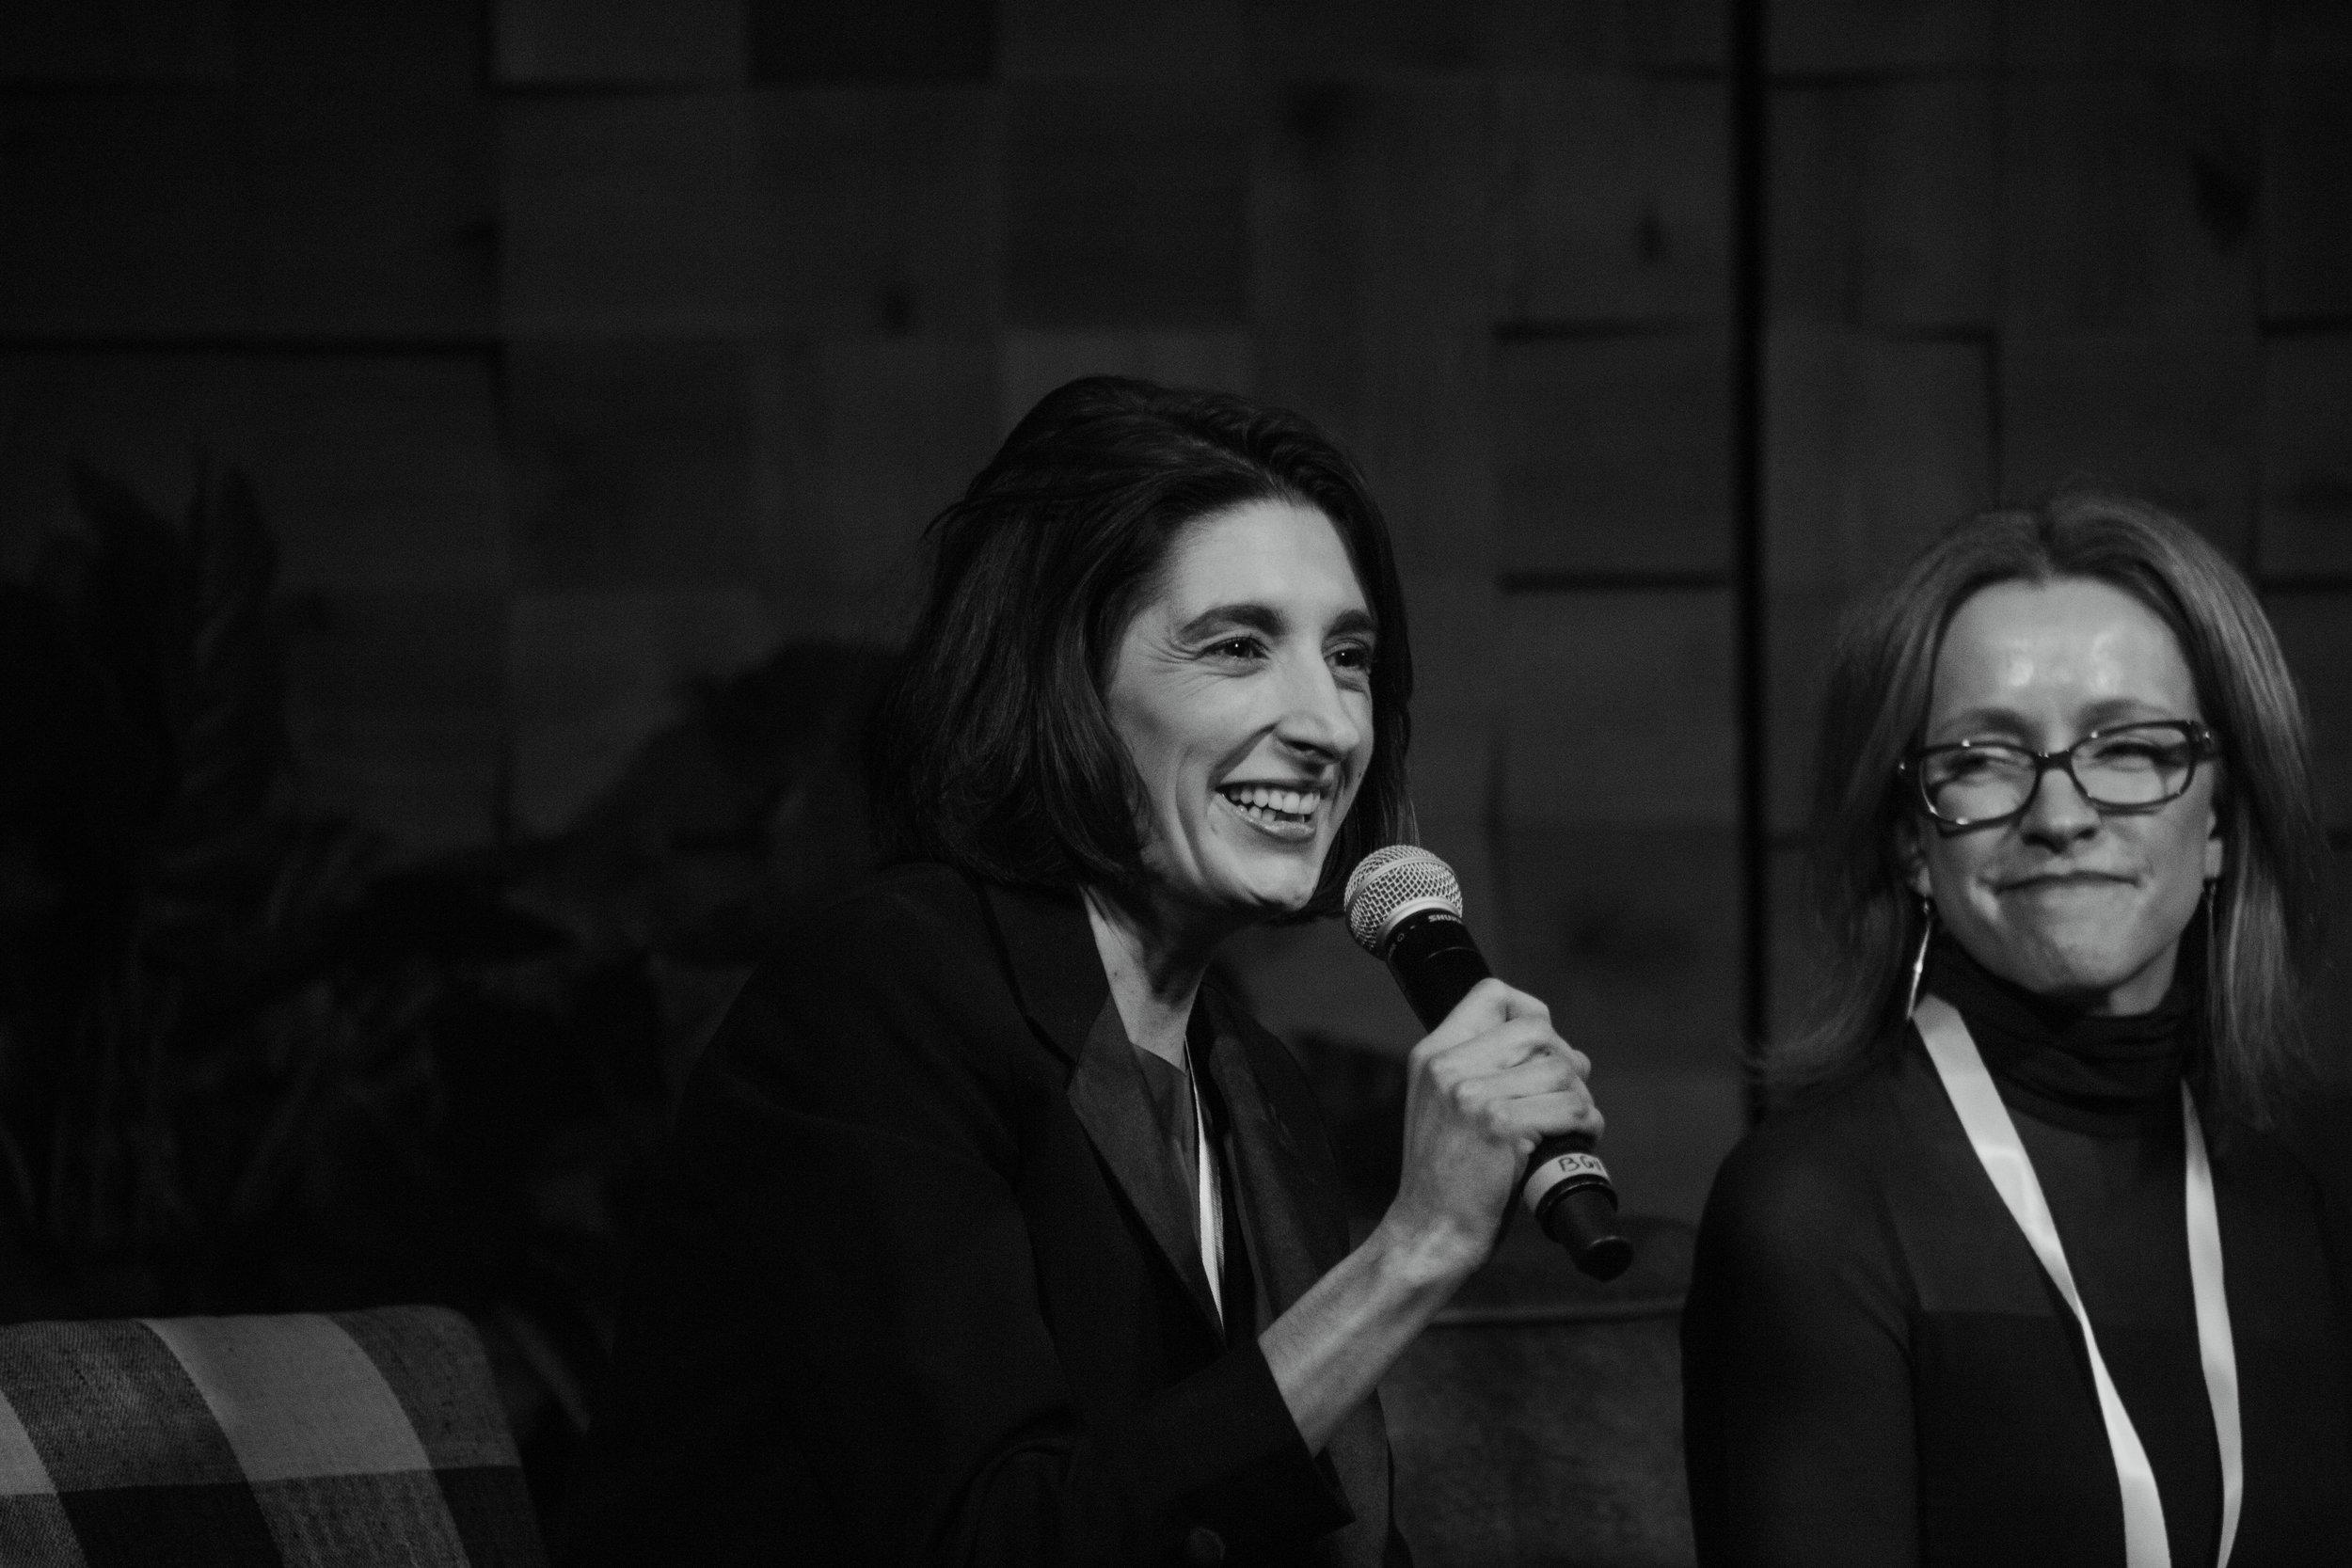 Marissa Ross and Christy Canterbury